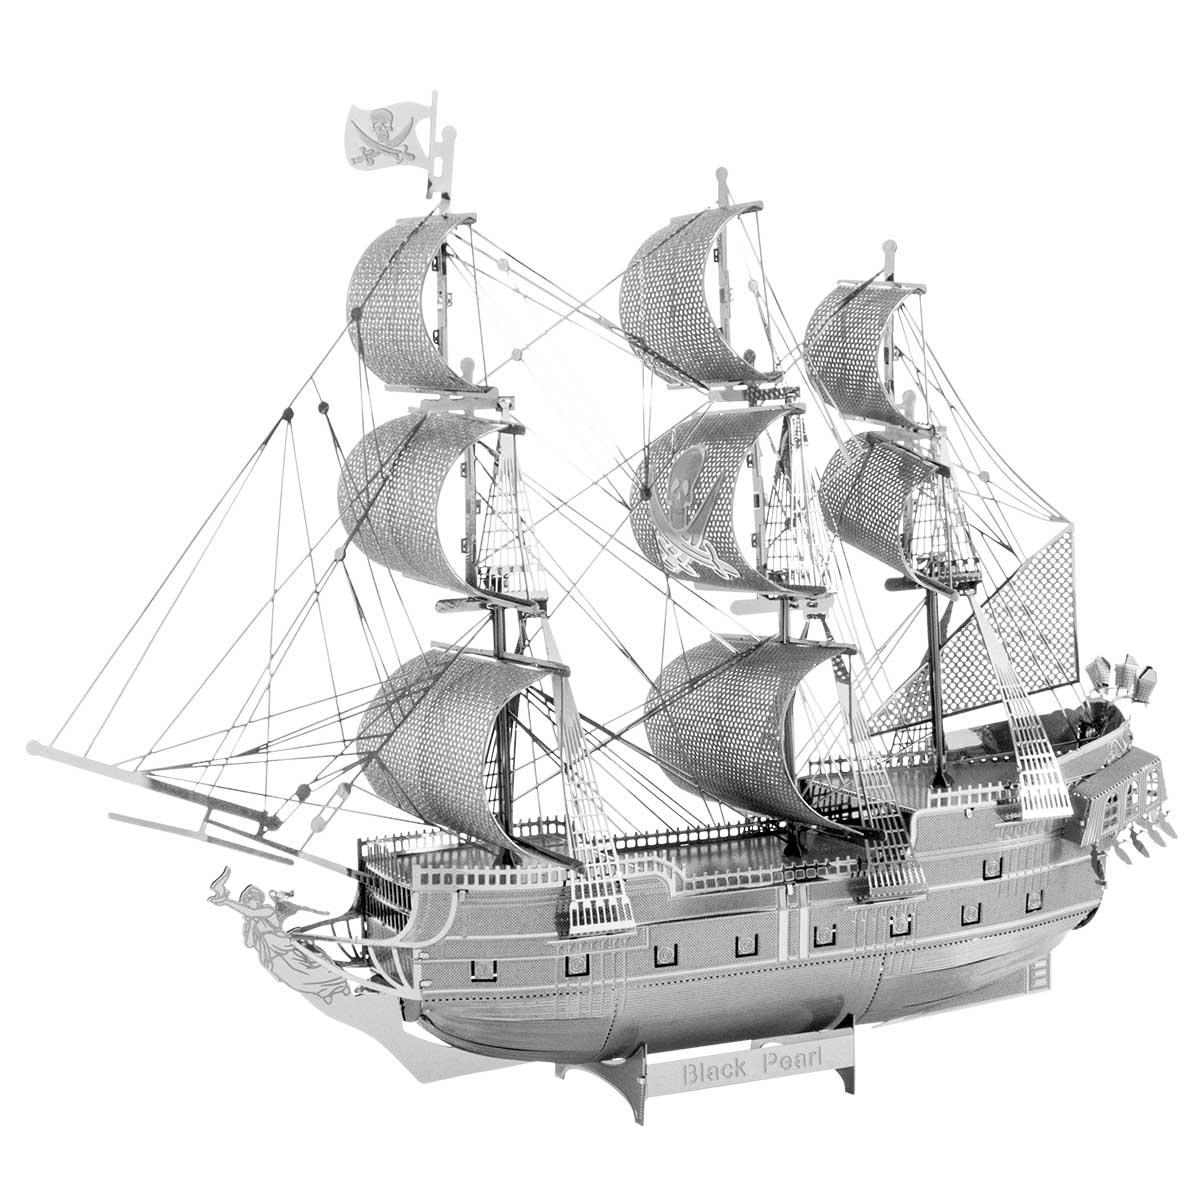 Black Pearl Ship Boats 3D Puzzle